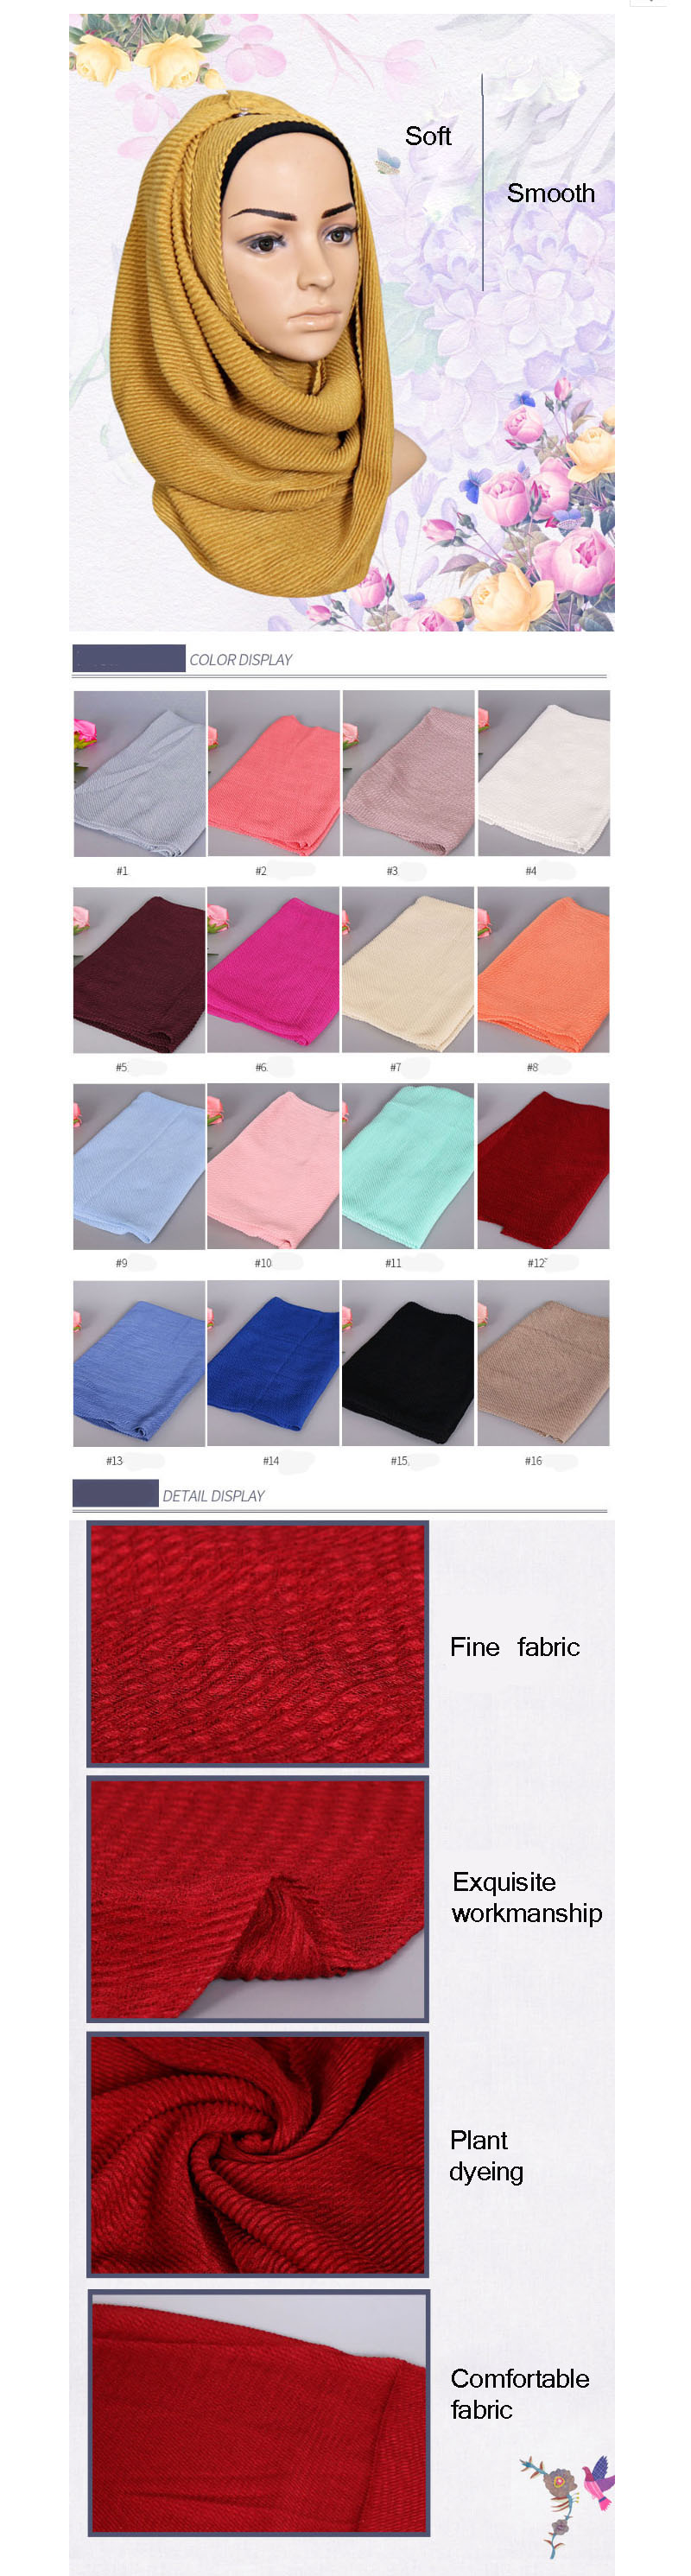 KL227 Taffeta Fashion Head Scarf Turbante Colorful Jersey Shawls Solid Inner Hijab Turban Muslim 180-80CM 9